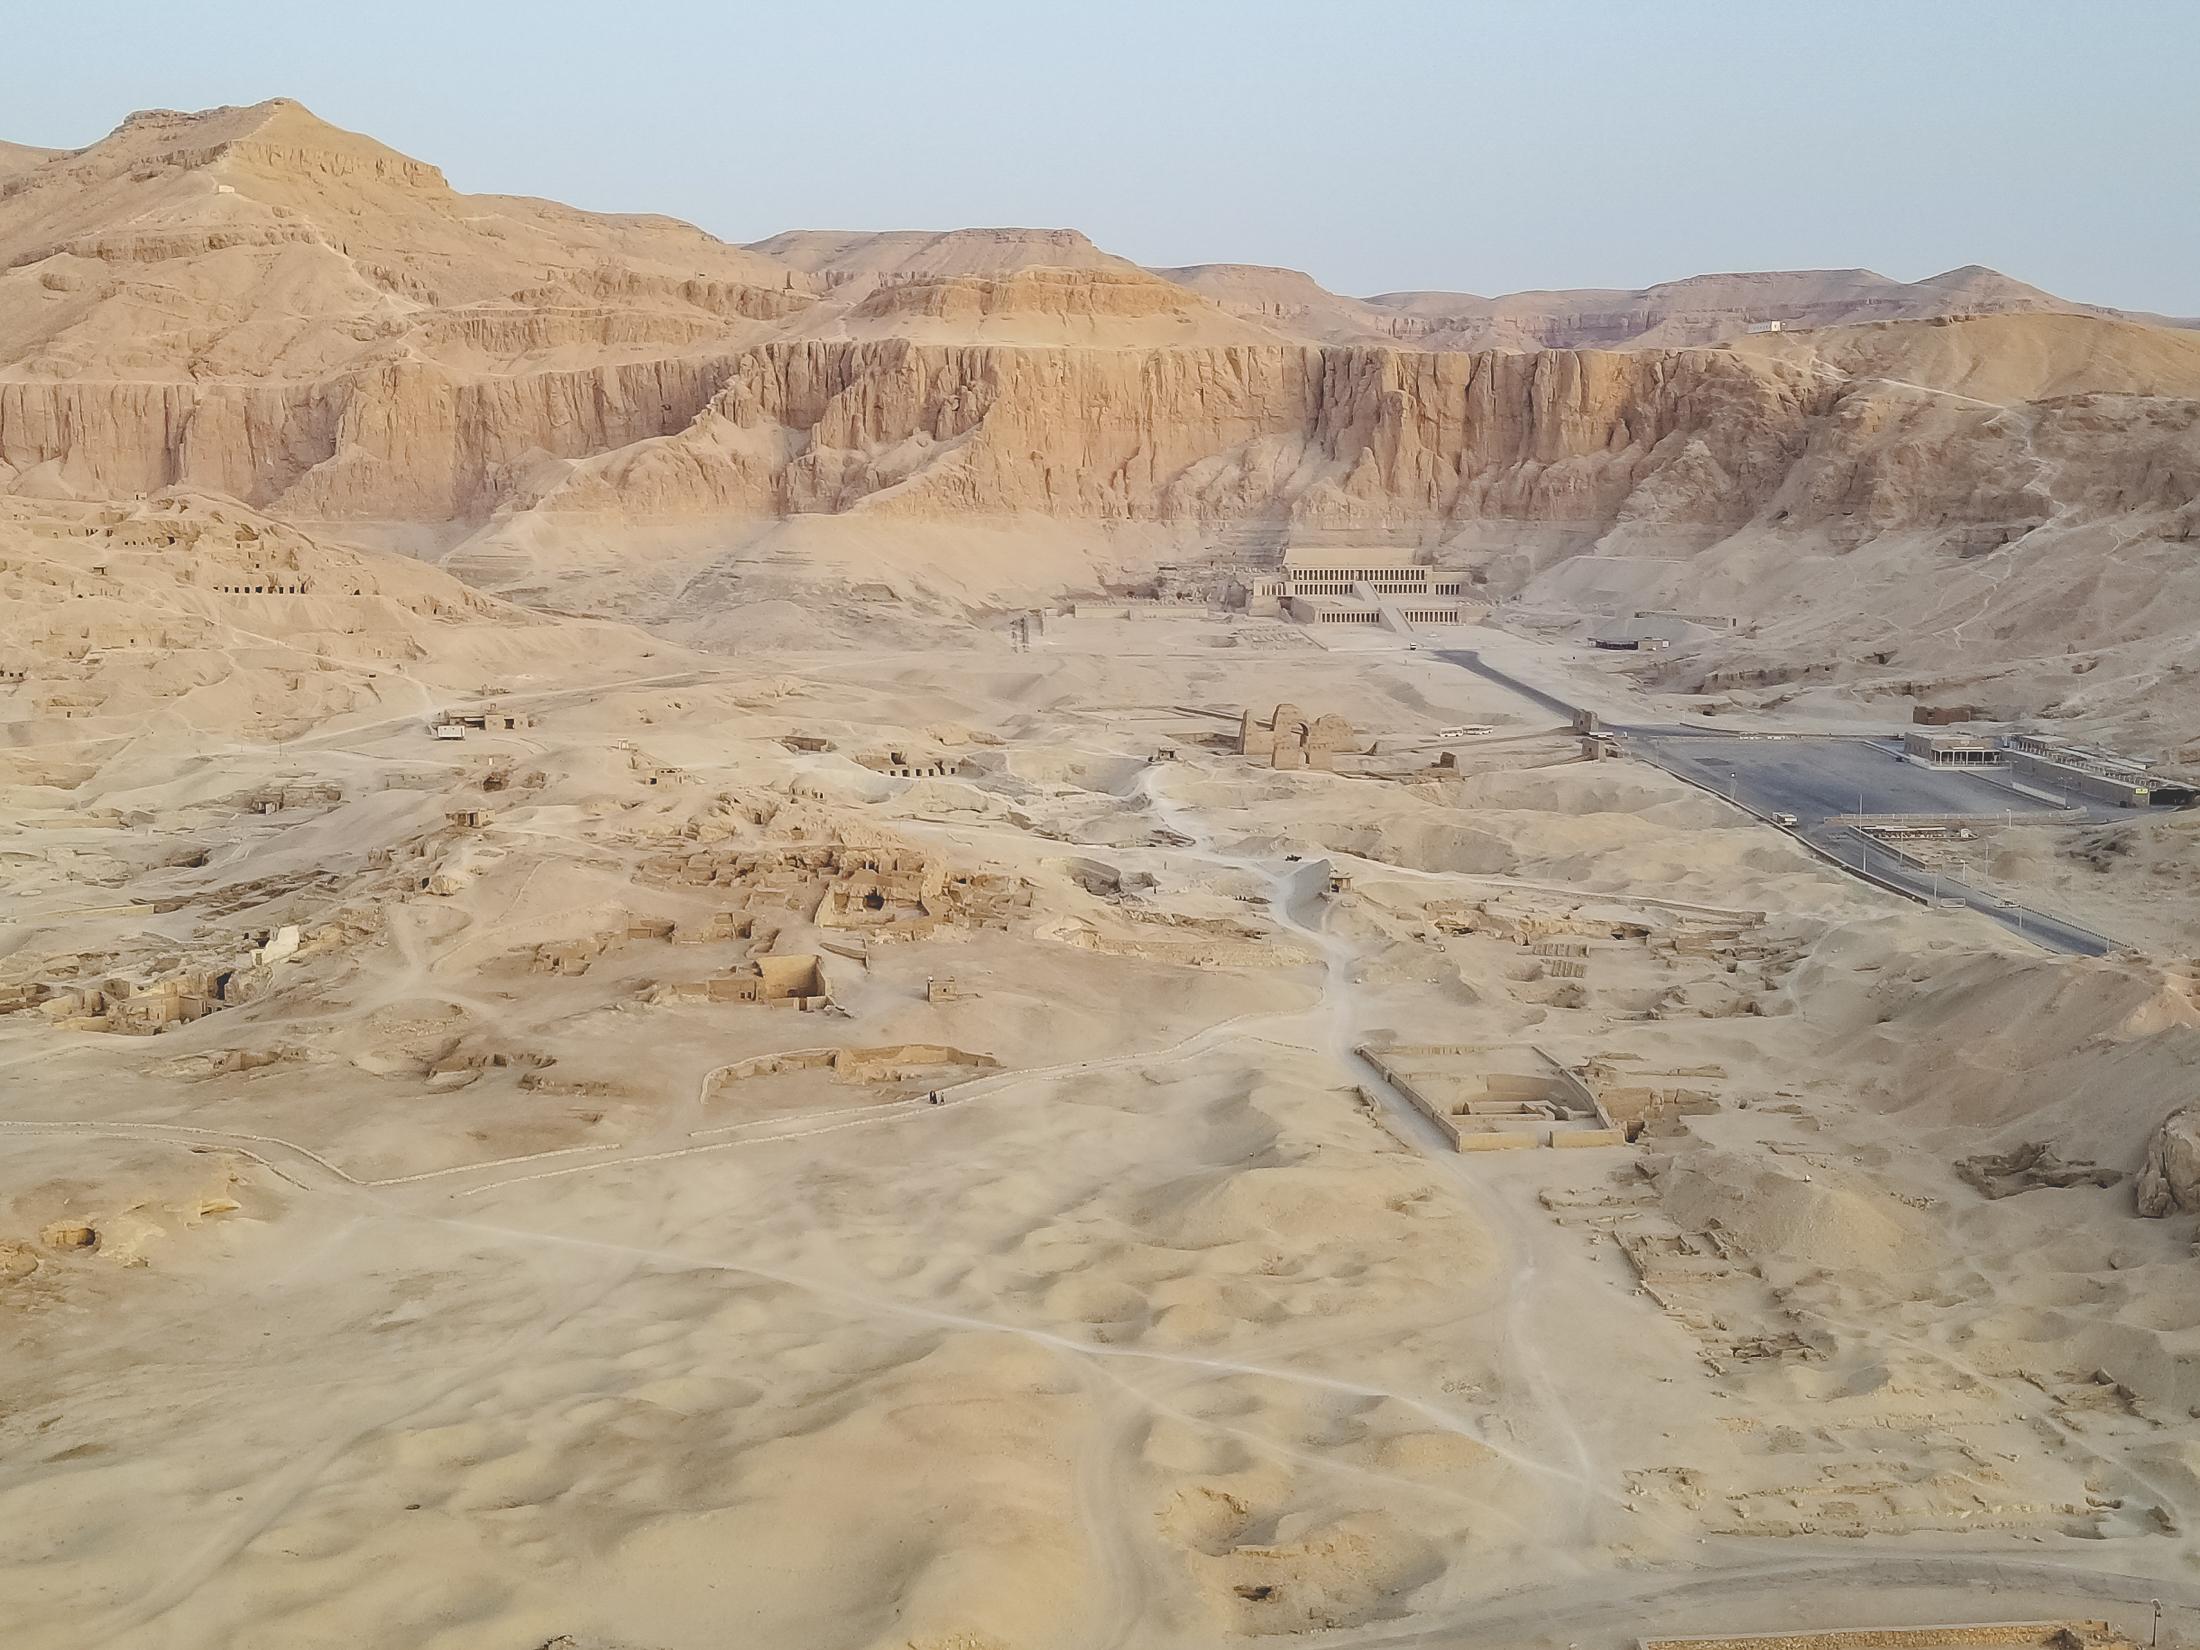 thetravelhub_egypt36.jpg